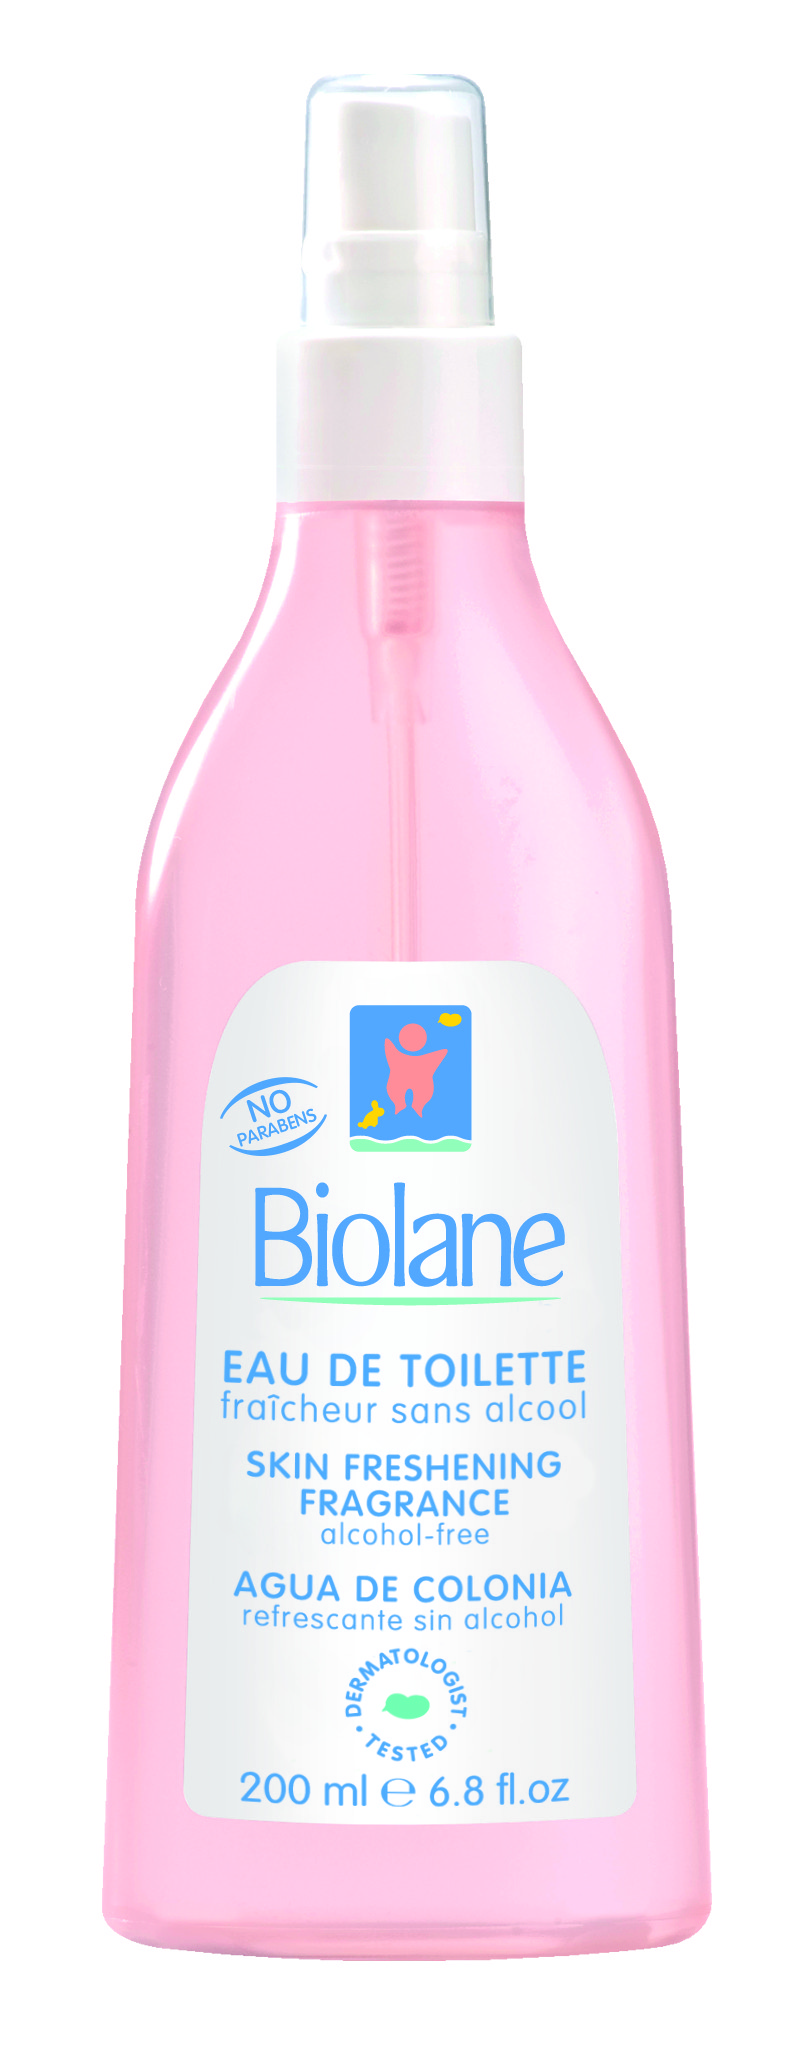 Image Skin Freshening Fragrance